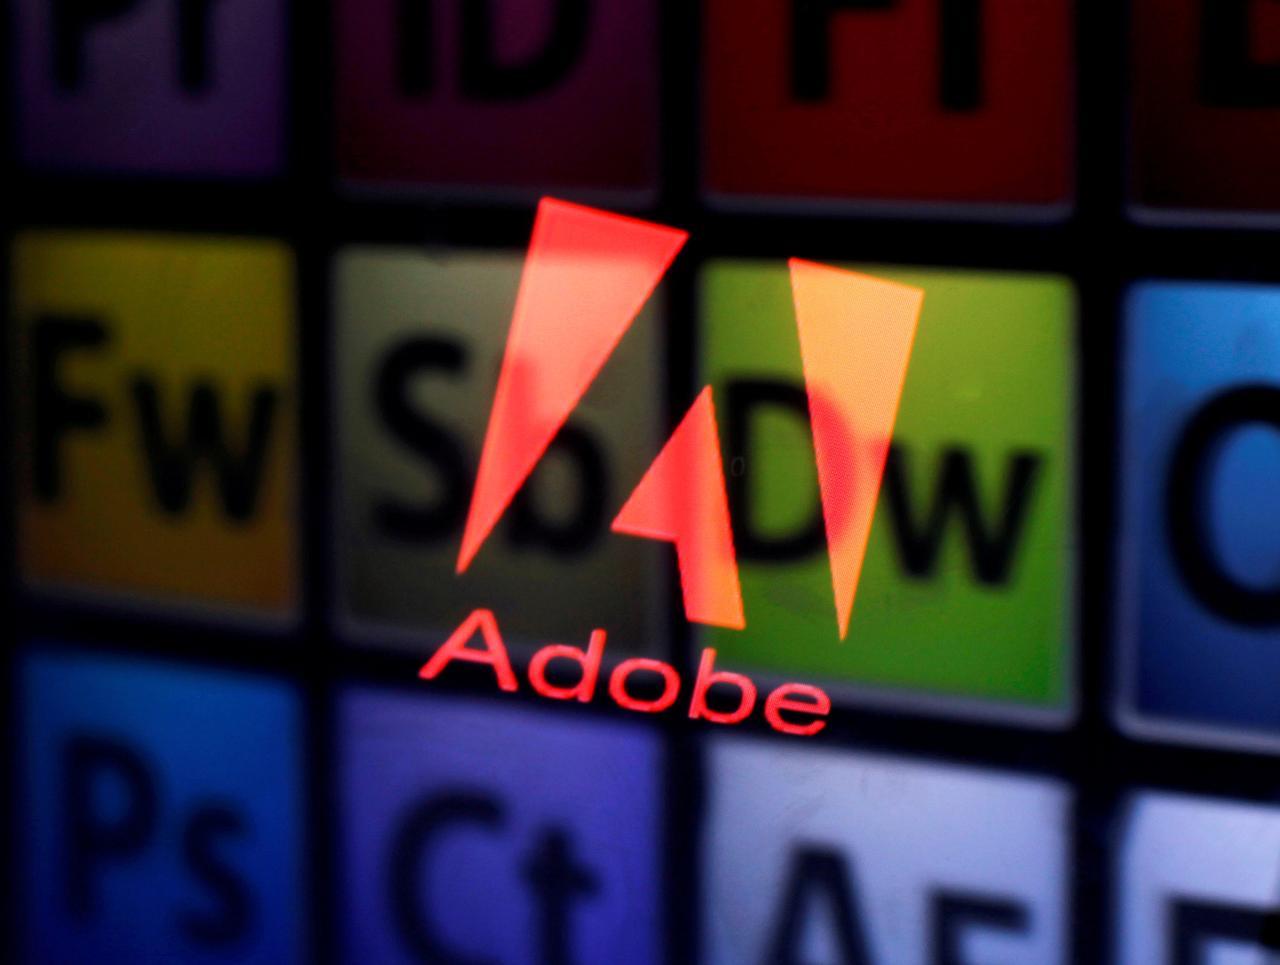 Adobe's first-quarter beats as Creative Cloud demand rises - Reuters